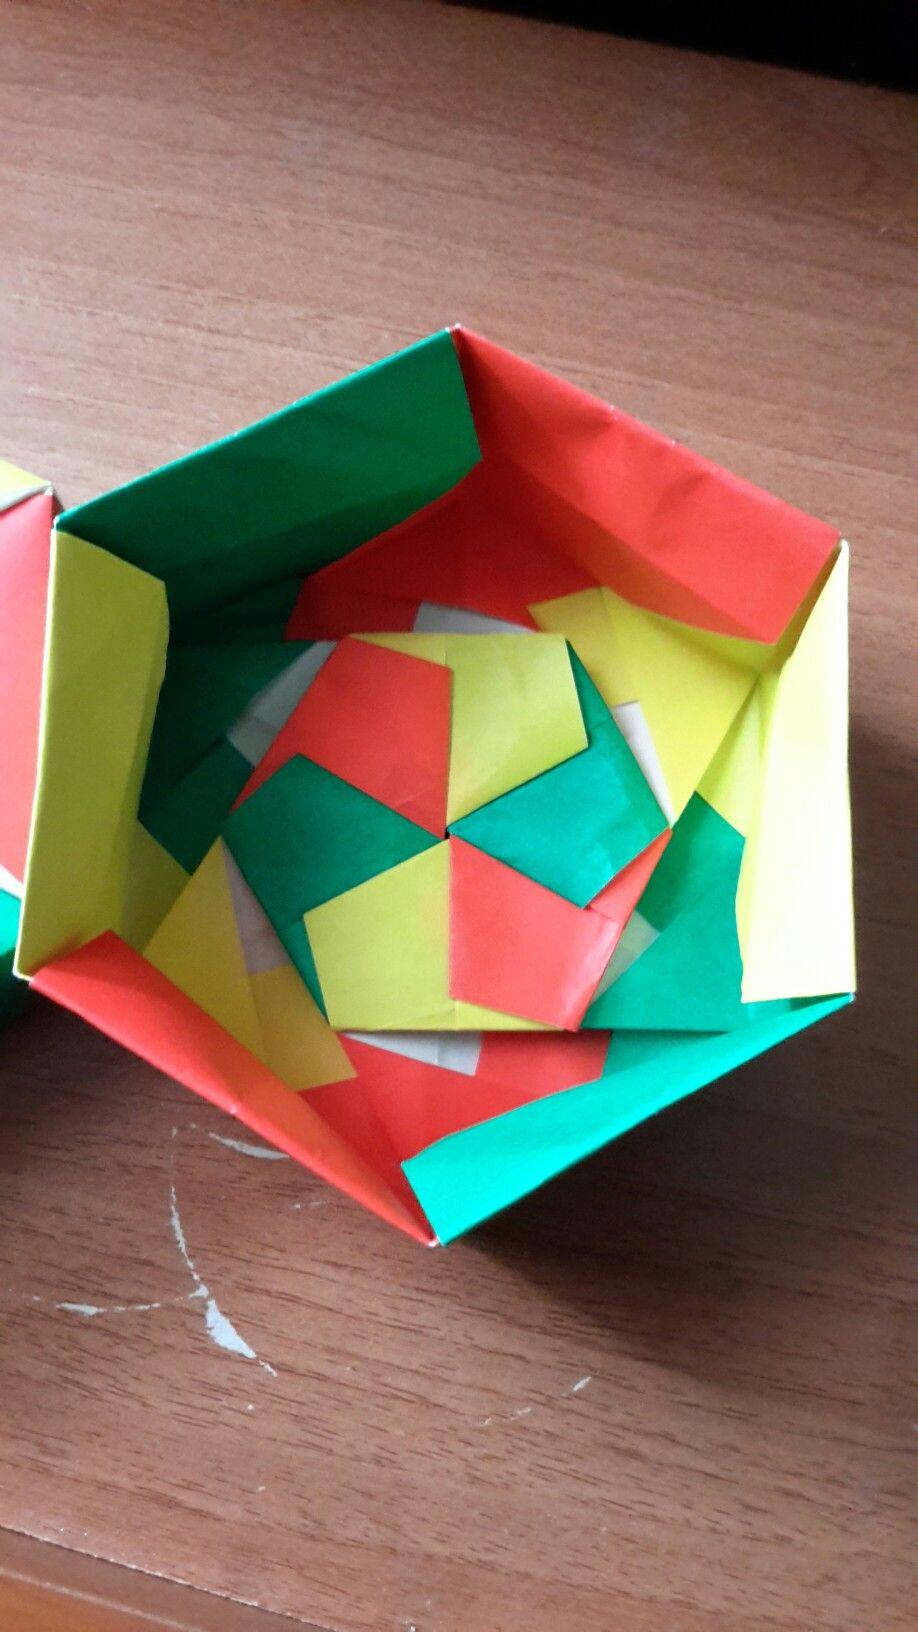 Hexagon box - Tomoko Fuse